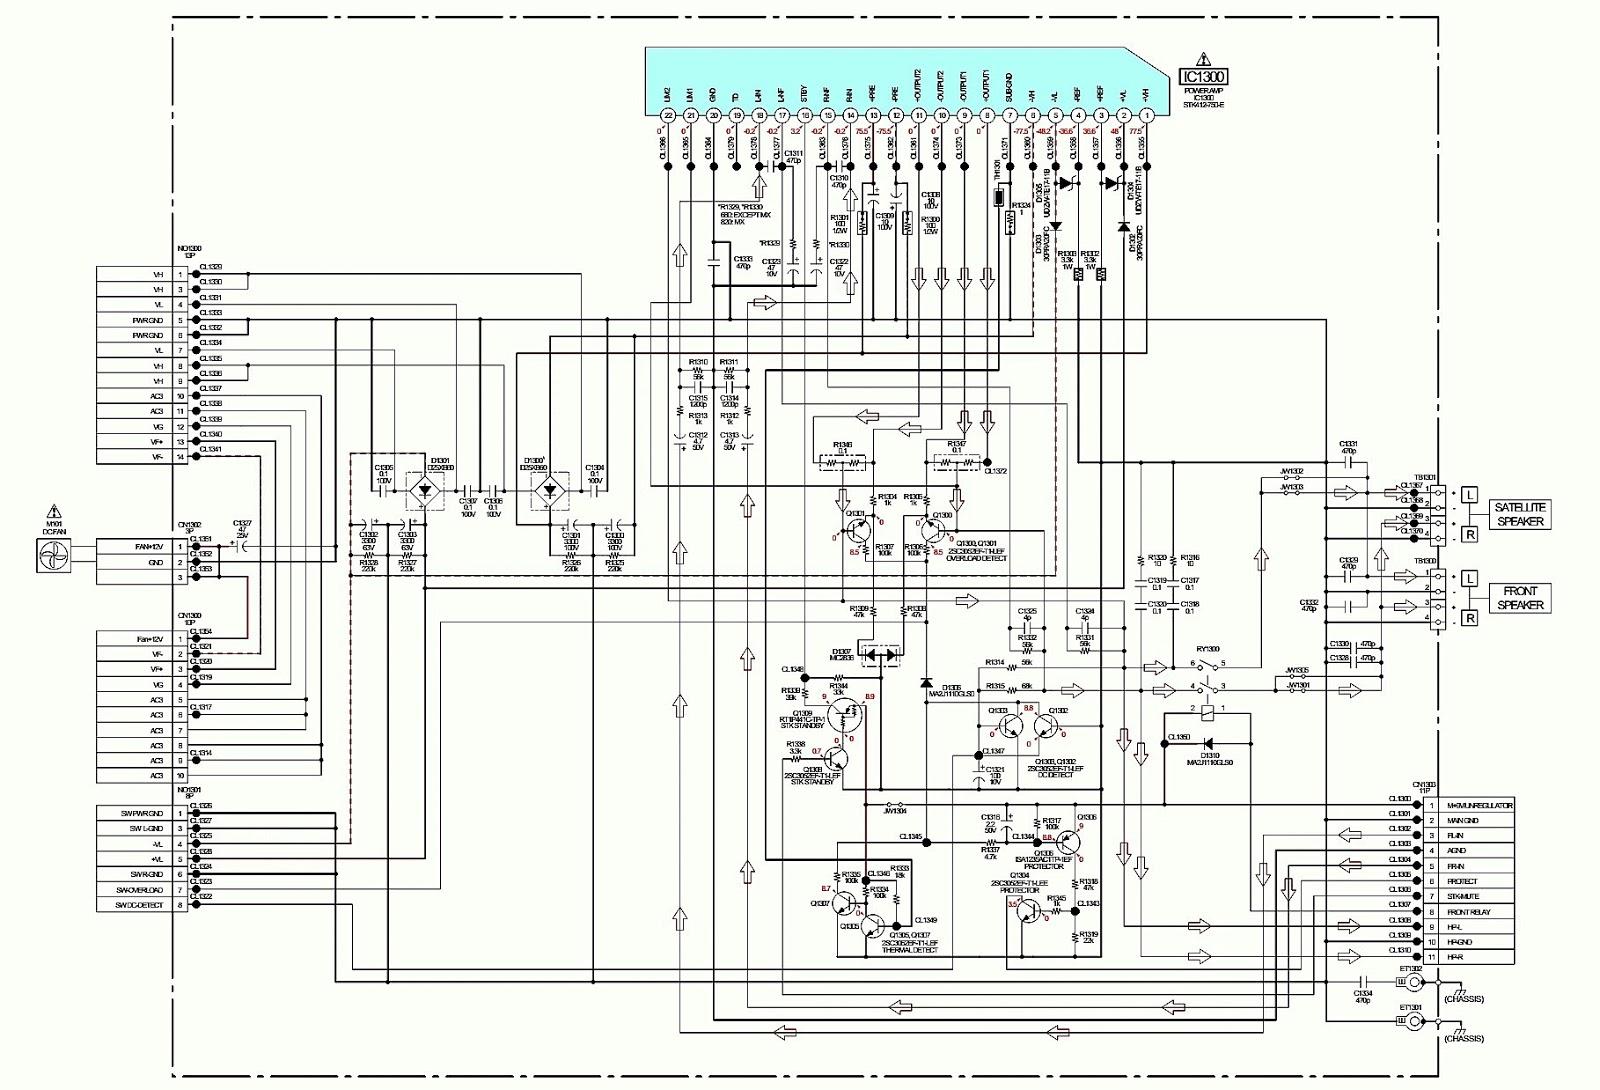 SONY HCDGTR88 Power Amplifier Circuit Diagram STK412750E